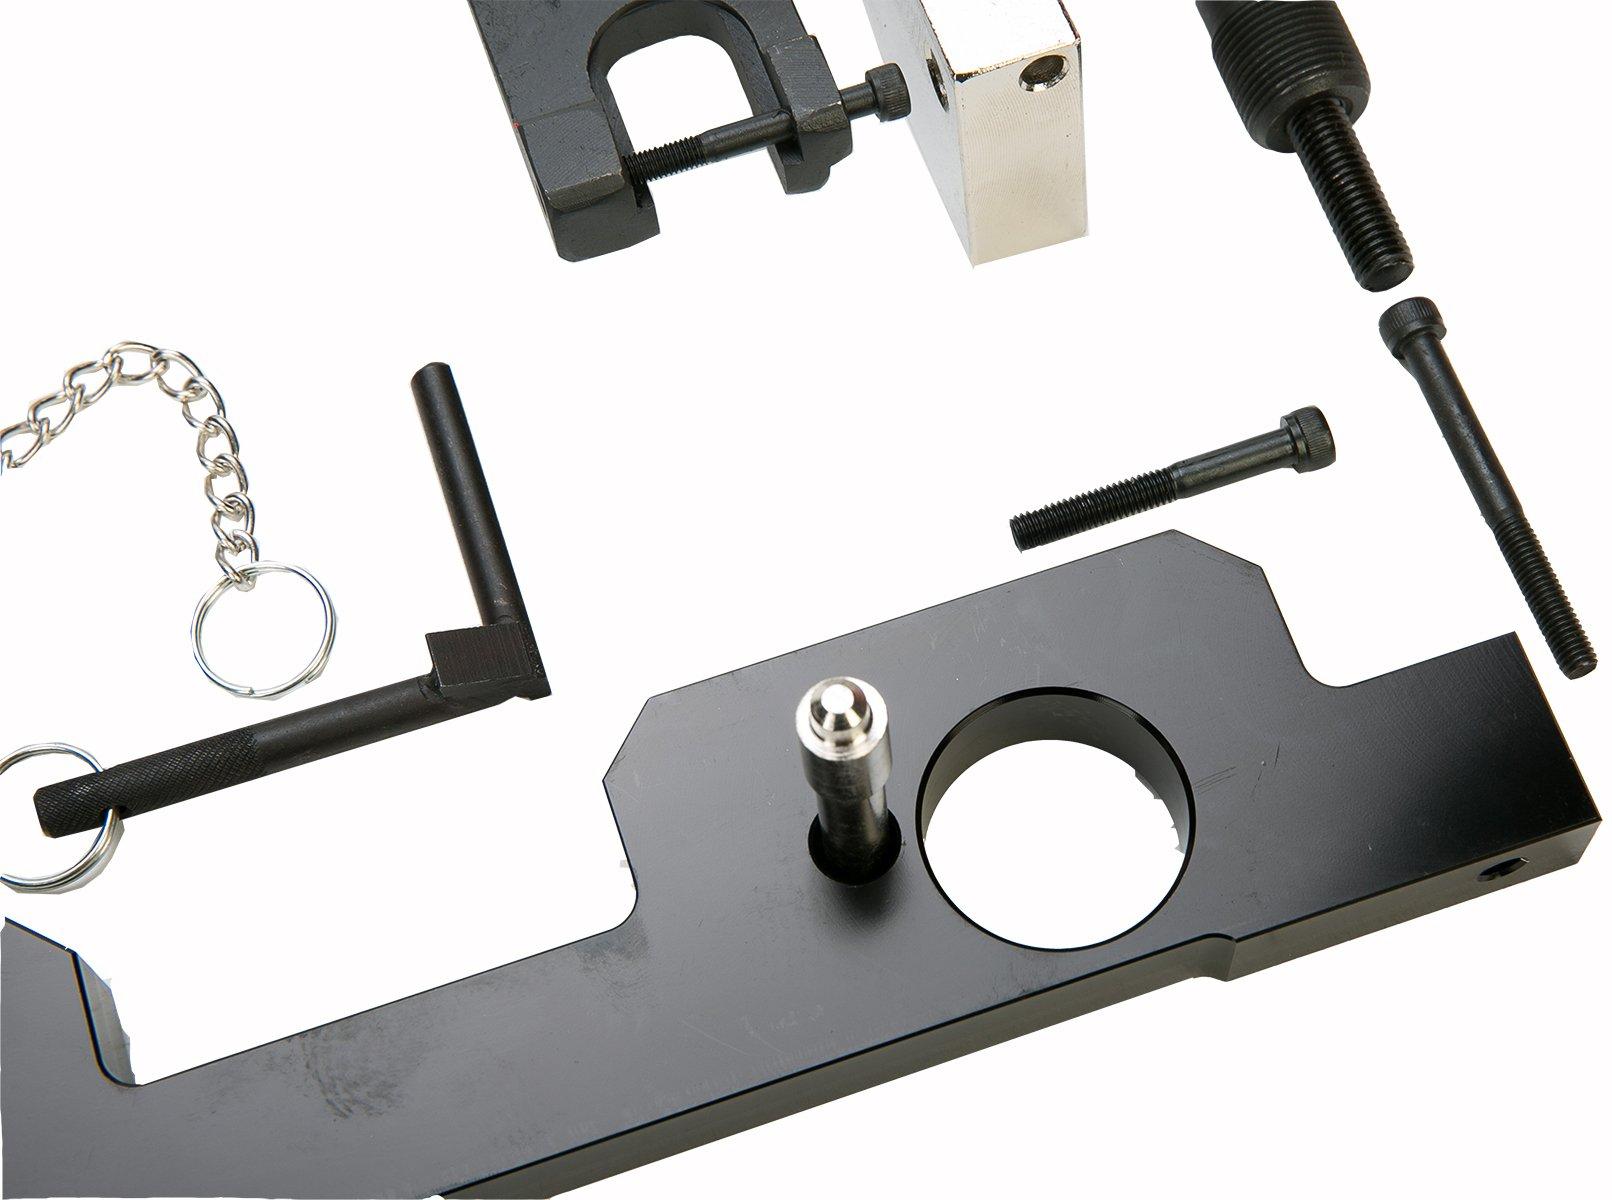 8MILELAKE Engine Alignment Locking Timing Tool Compatible for BMW N20 N26 Vanos Cam Camshaft by 8MILELAKE (Image #2)